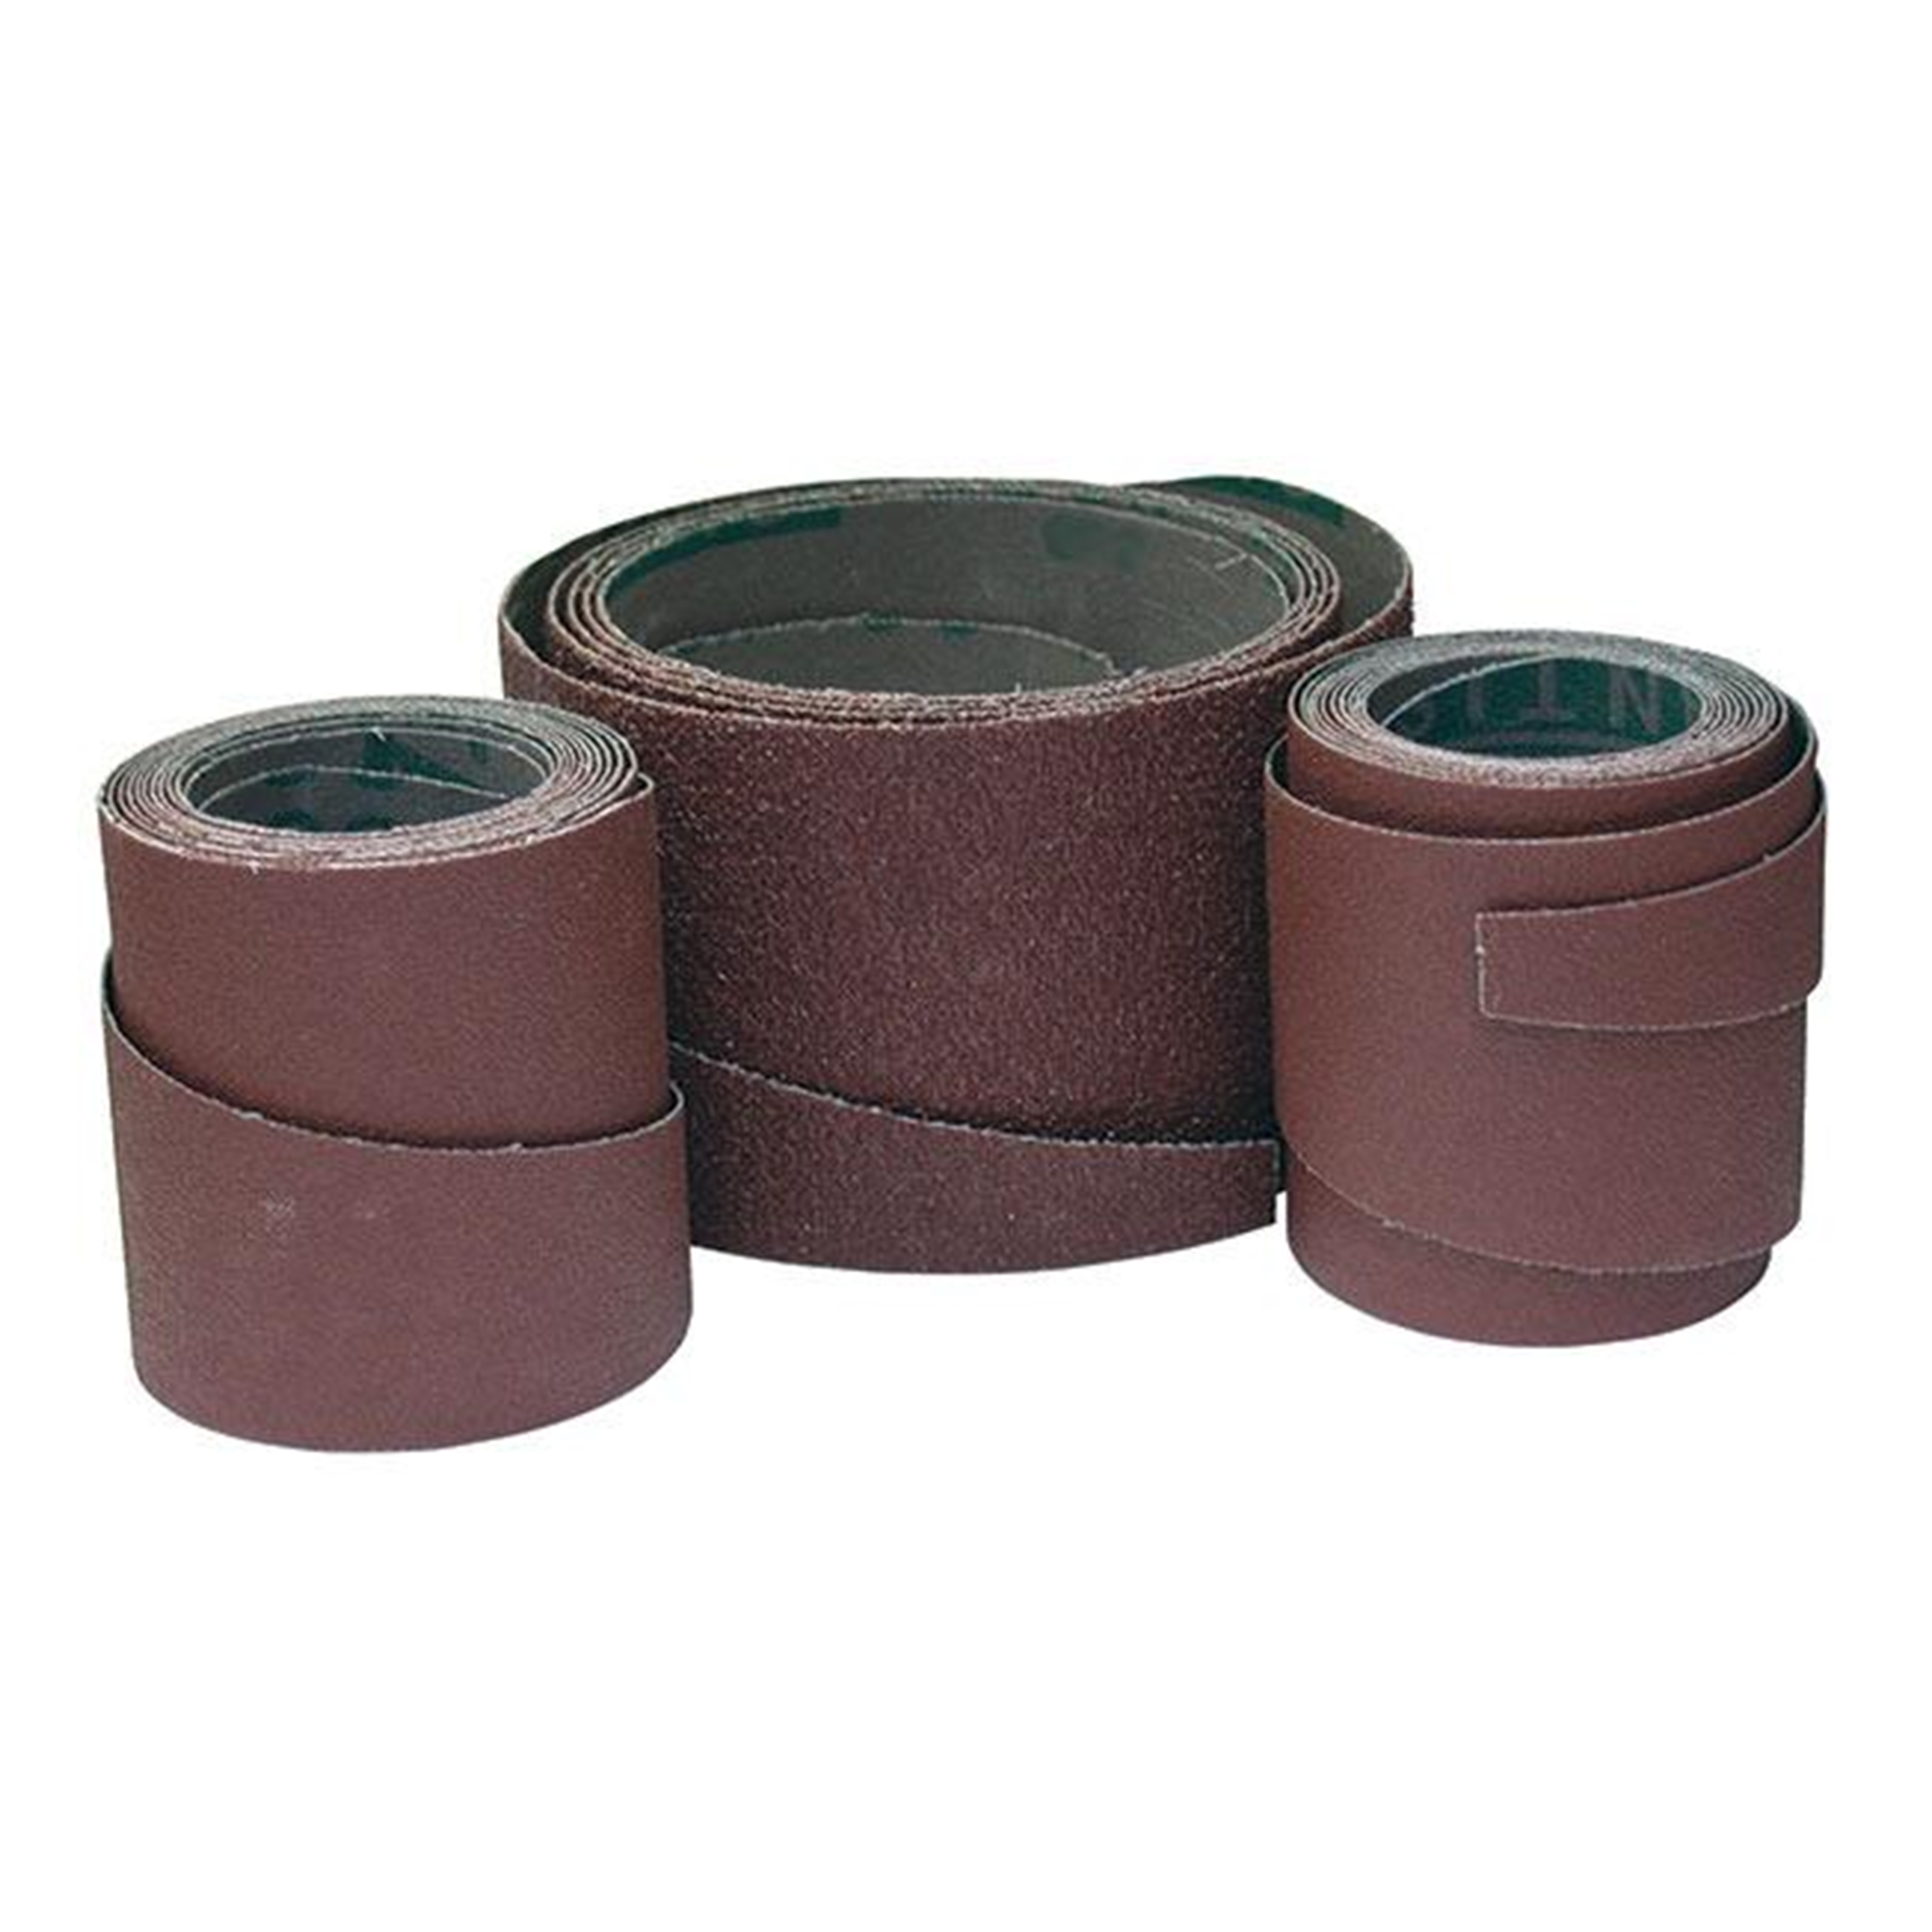 Sandpaper Wrap for 19-38 Drum Sanders 100 Grit 3 pk